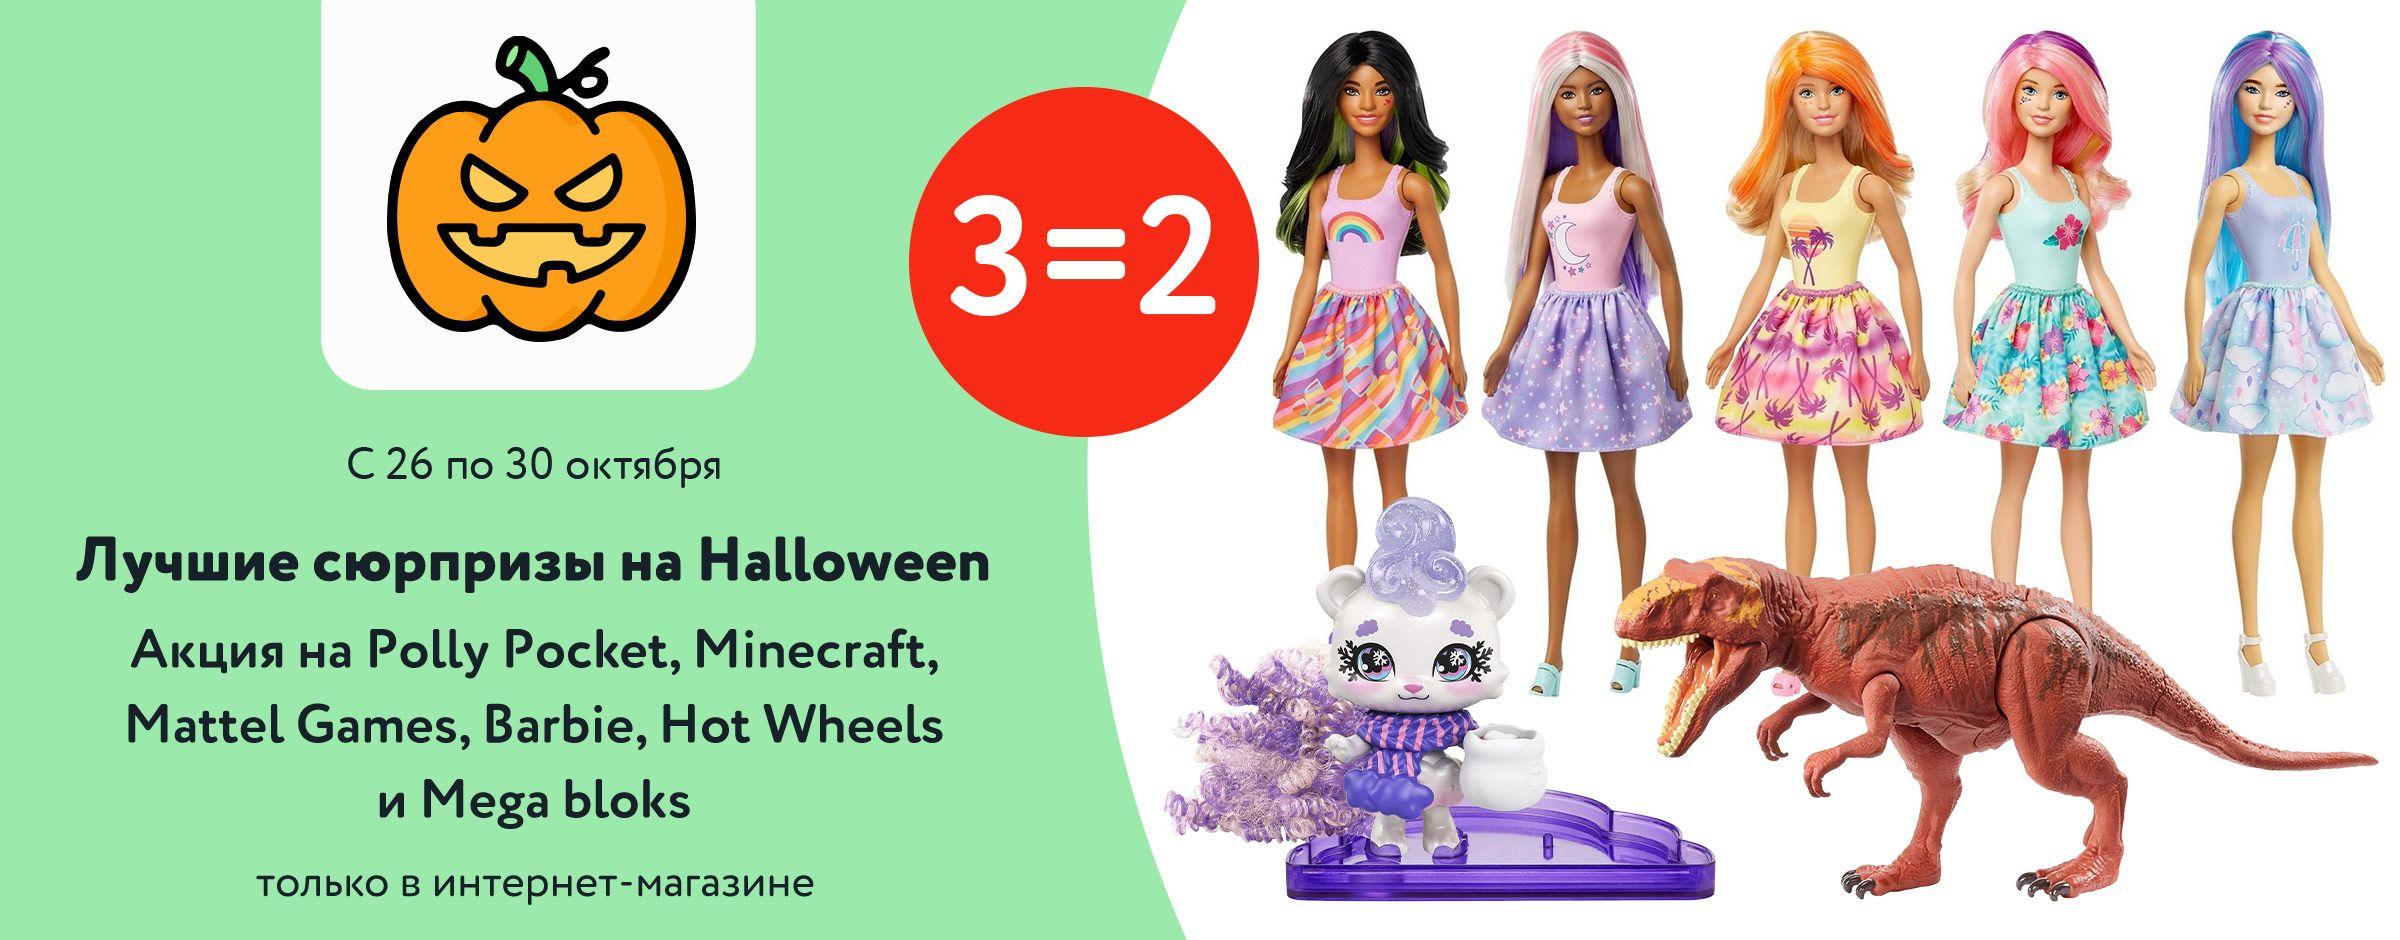 3=2 на Polly Pocket, Minecraft, Mattel Games, Barbie, Hot Wheels и Mega bloks!